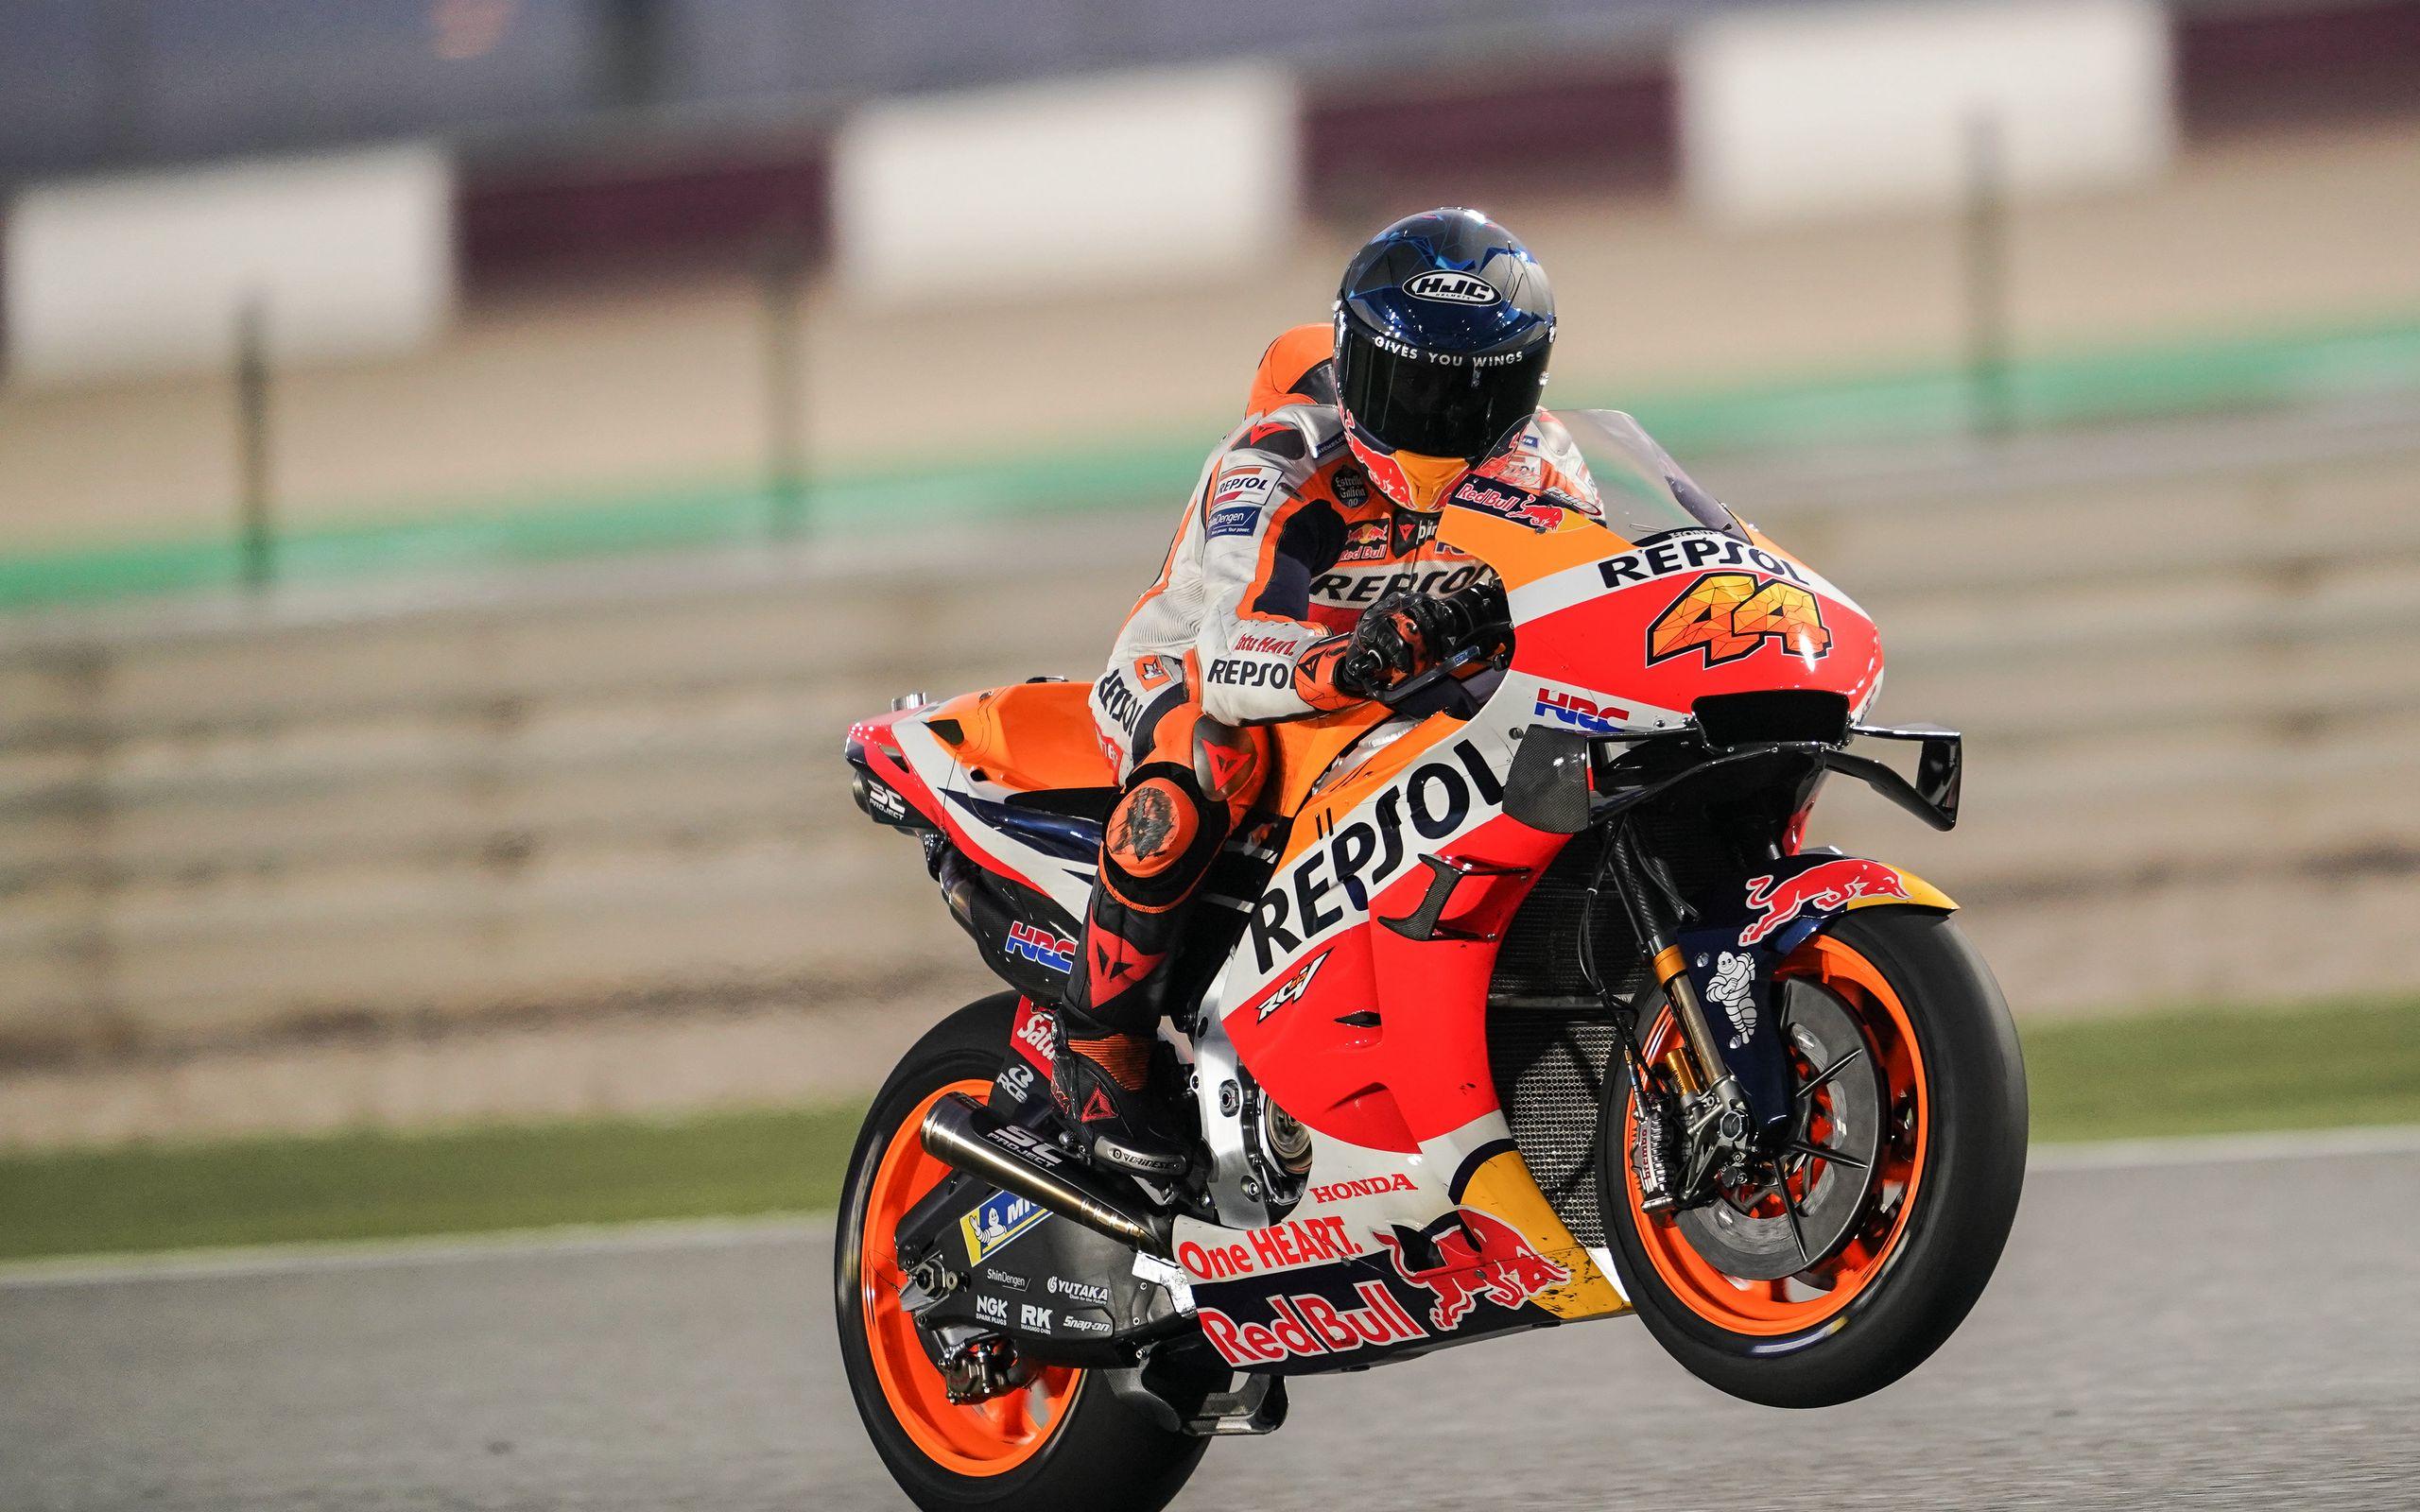 2560x1600 Wallpaper honda, motorcycle, motorcyclist, helmet, speed, track, orange